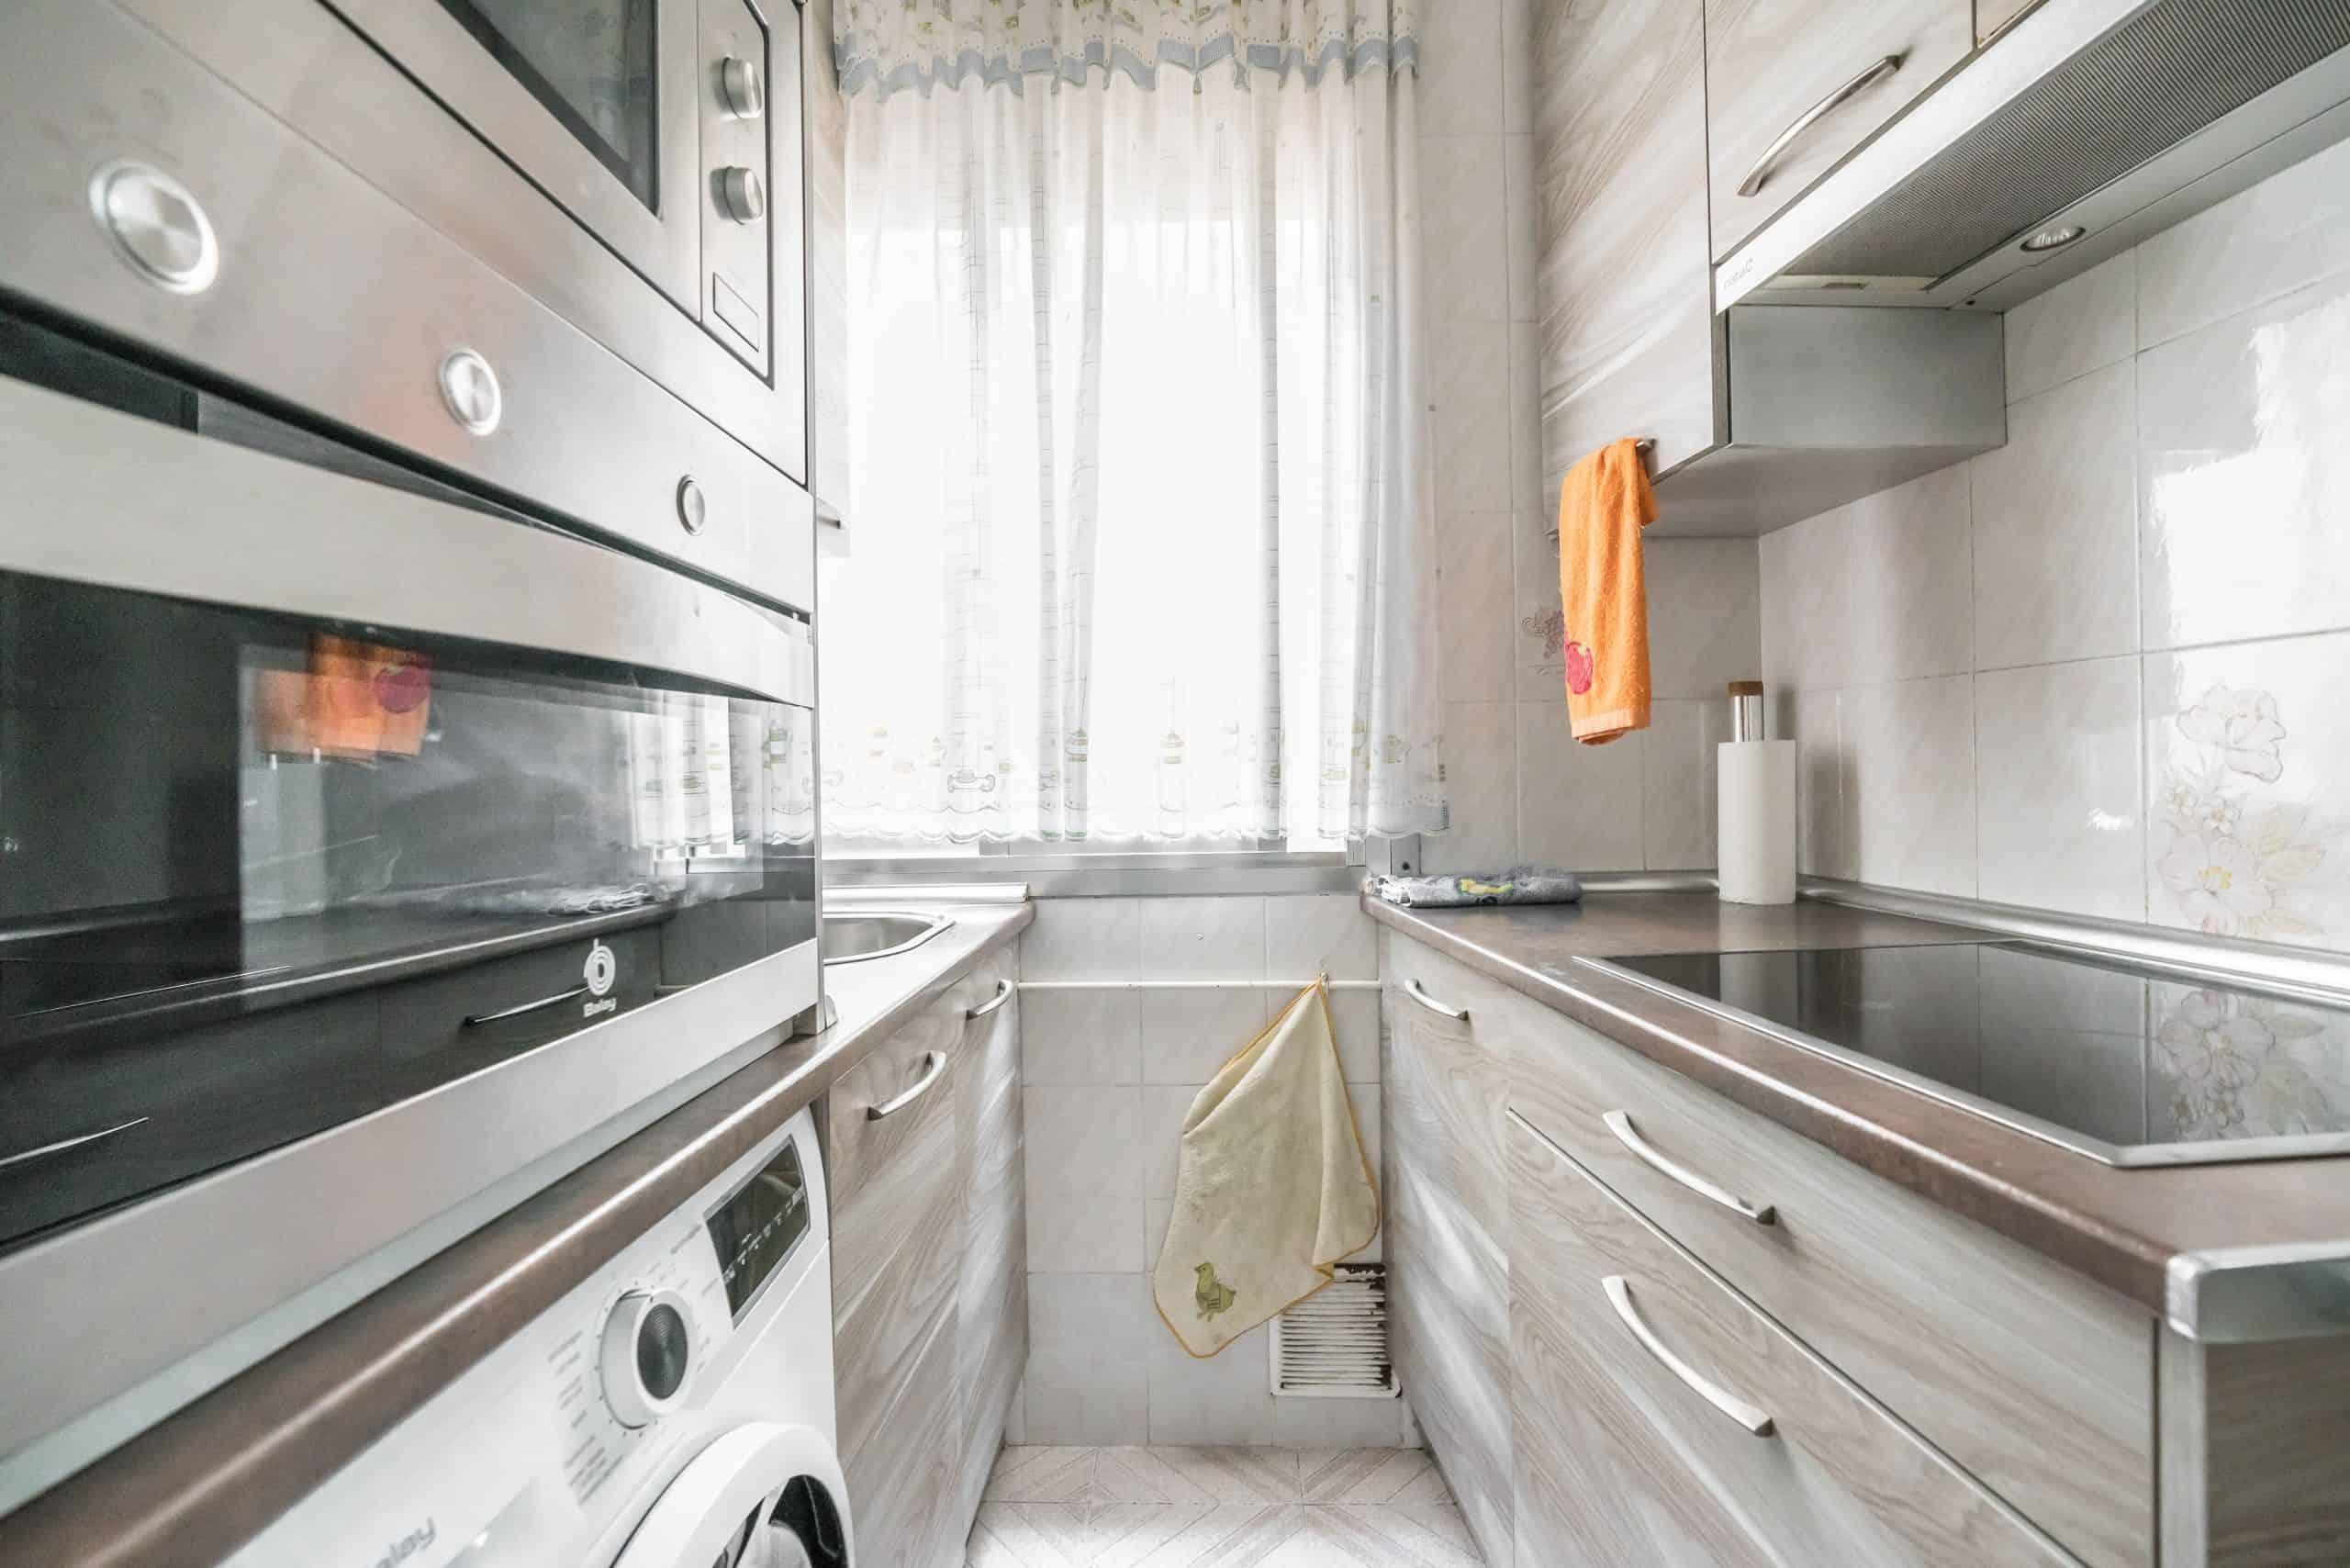 Agencia Inmobiliaria de Madrid-FUTUROCASA-Zona ARGANZUELA-EMBAJADORES-LEGAZPI5 COCINA (4)